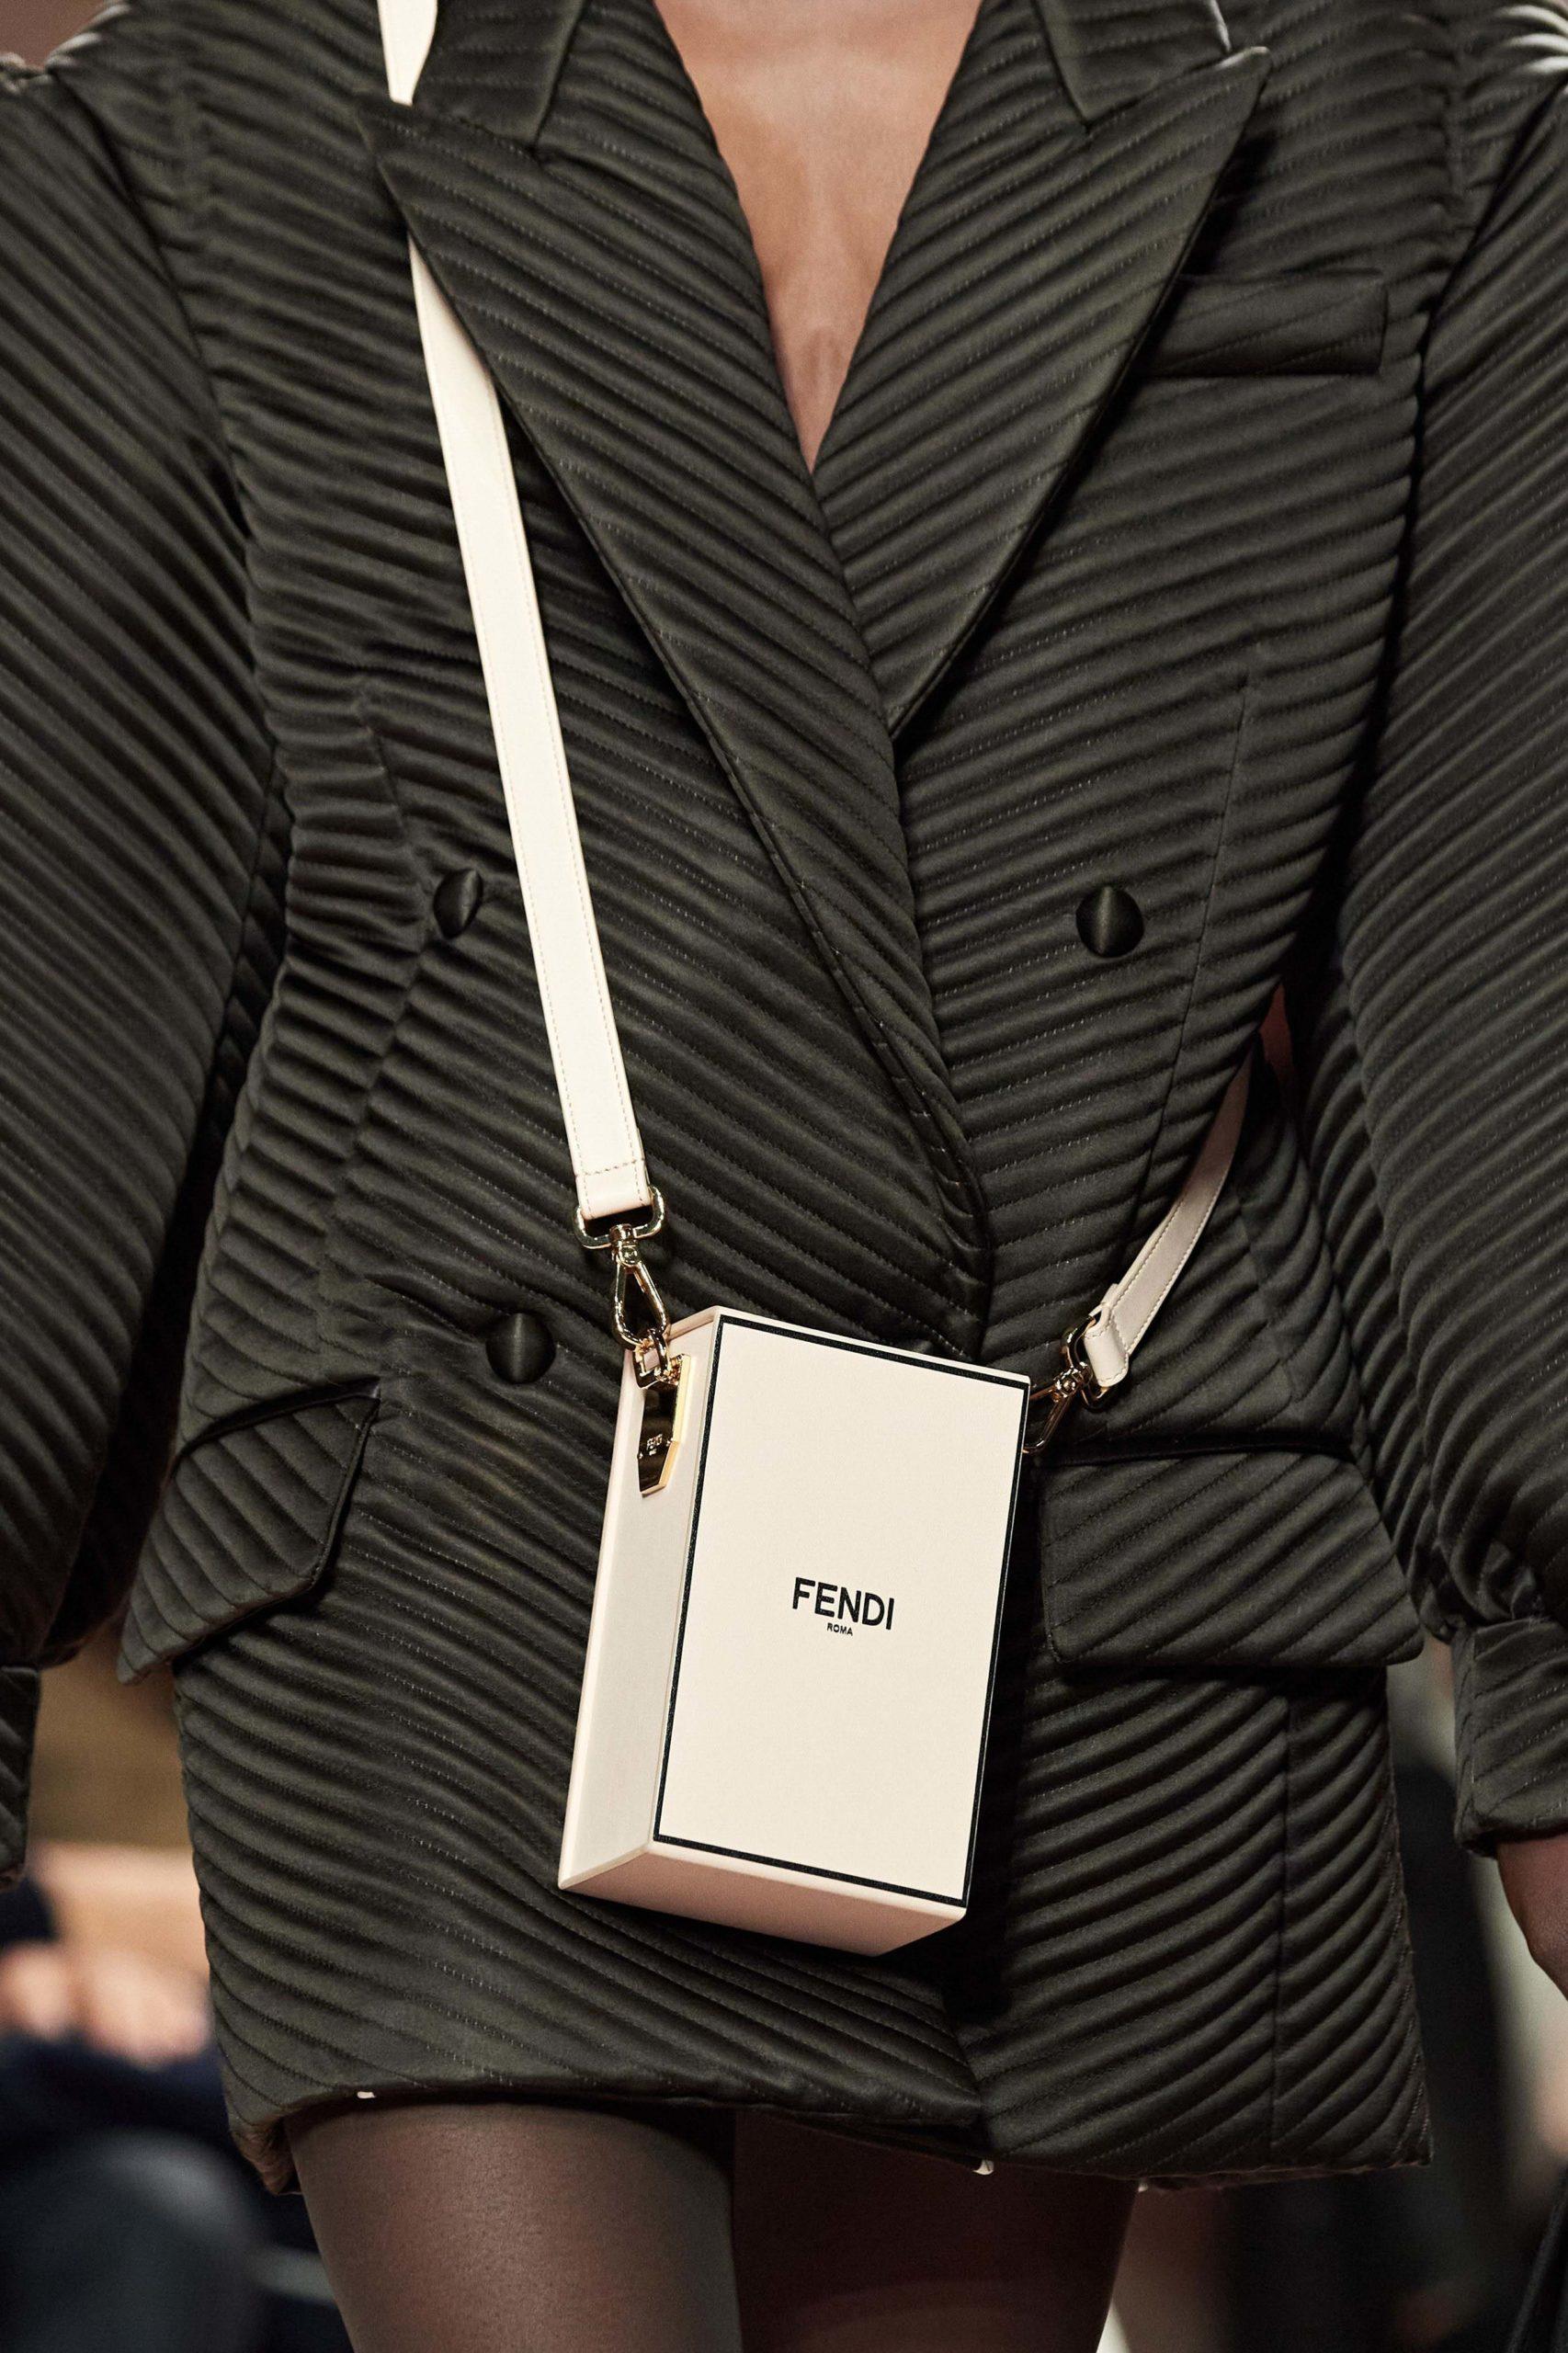 Fendi Fall 2020 trends runway report Ready To Wear Vogue fendi brown vintage feel. box bag